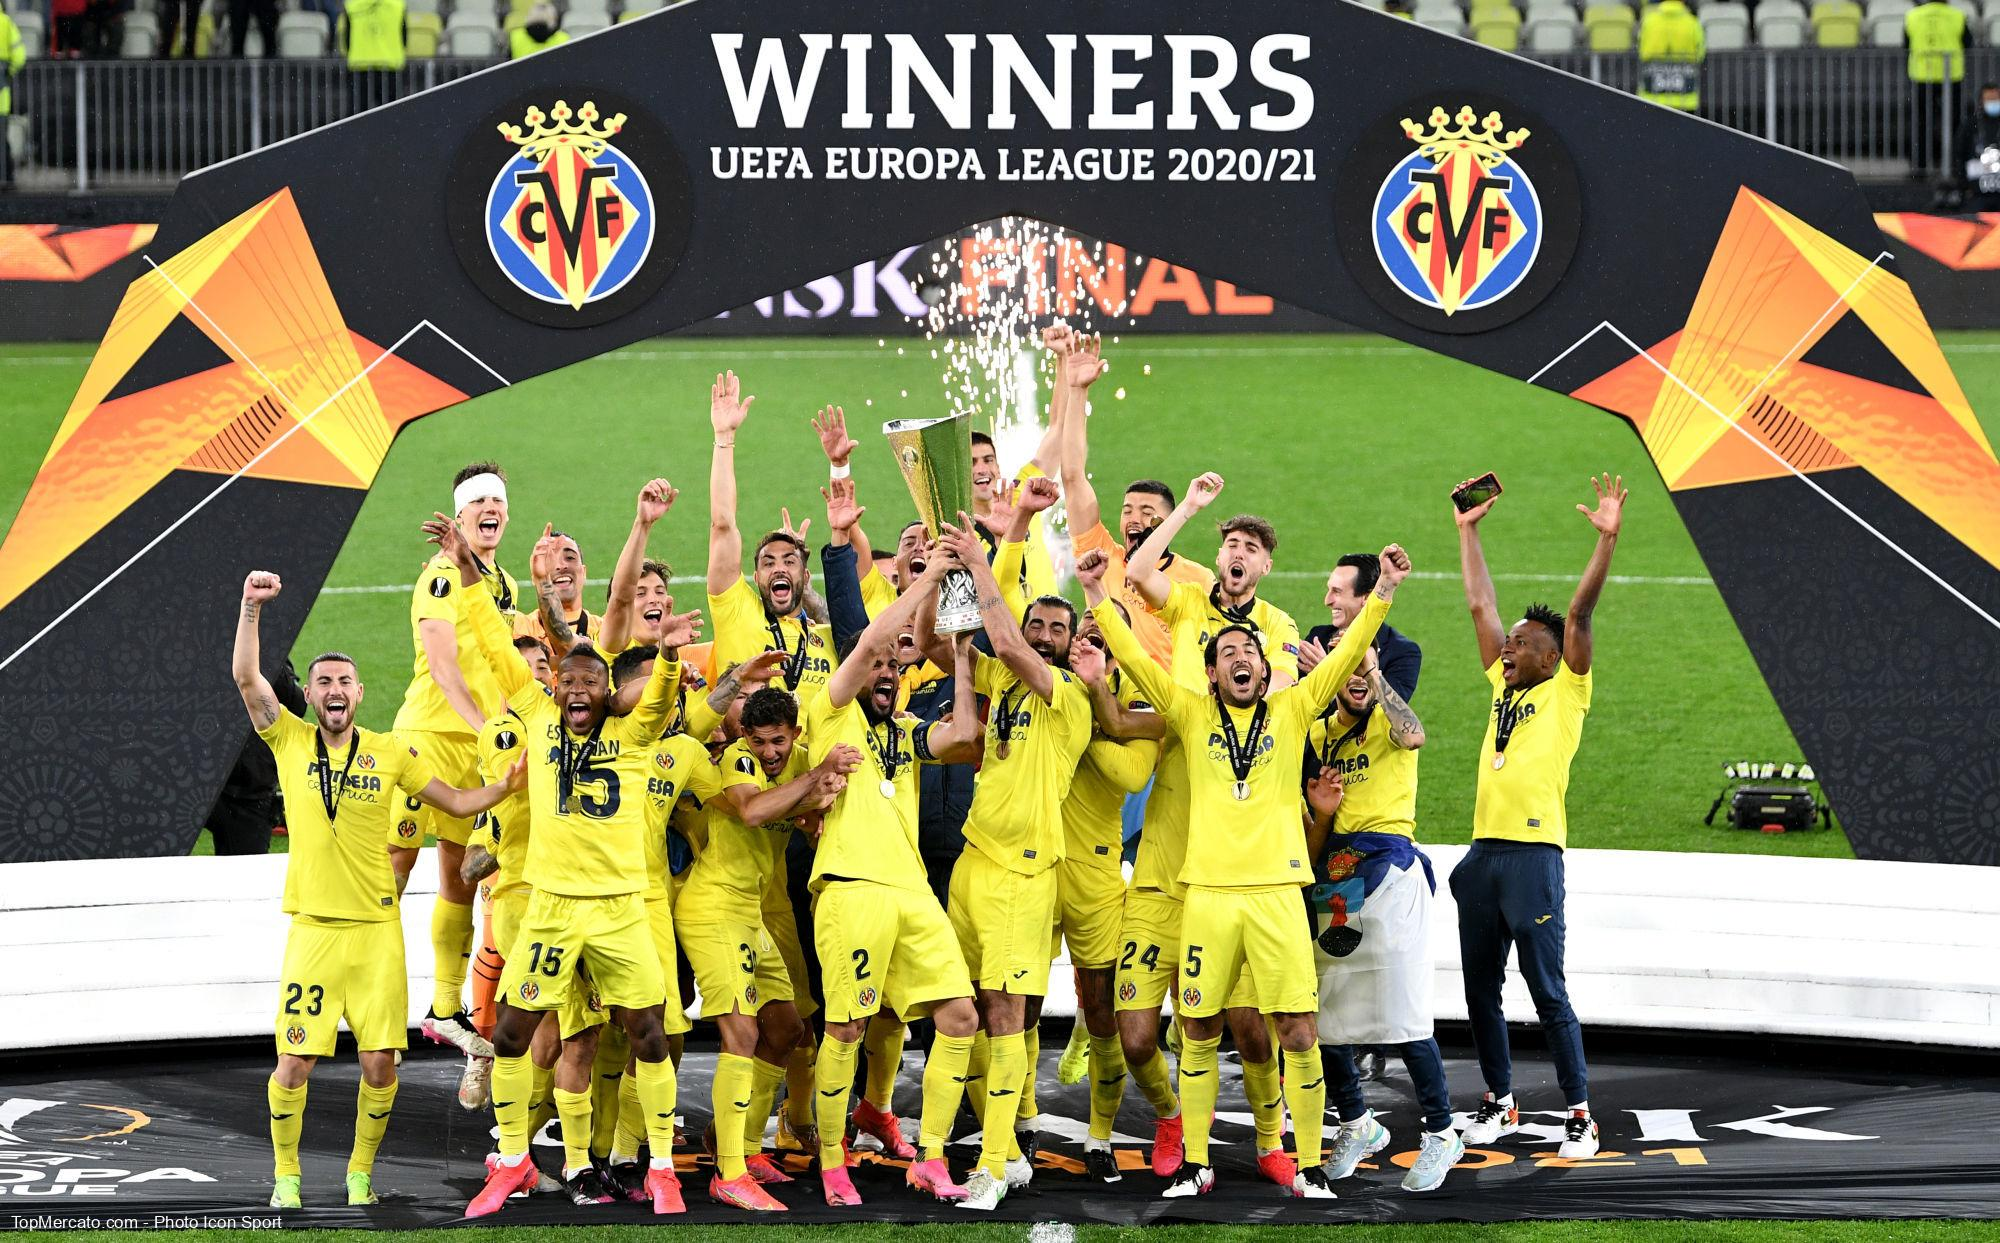 https://www.topmercato.com/wp-content/uploads/2021/05/Villarreal-Manchester-United-Ligue-Europa.jpg